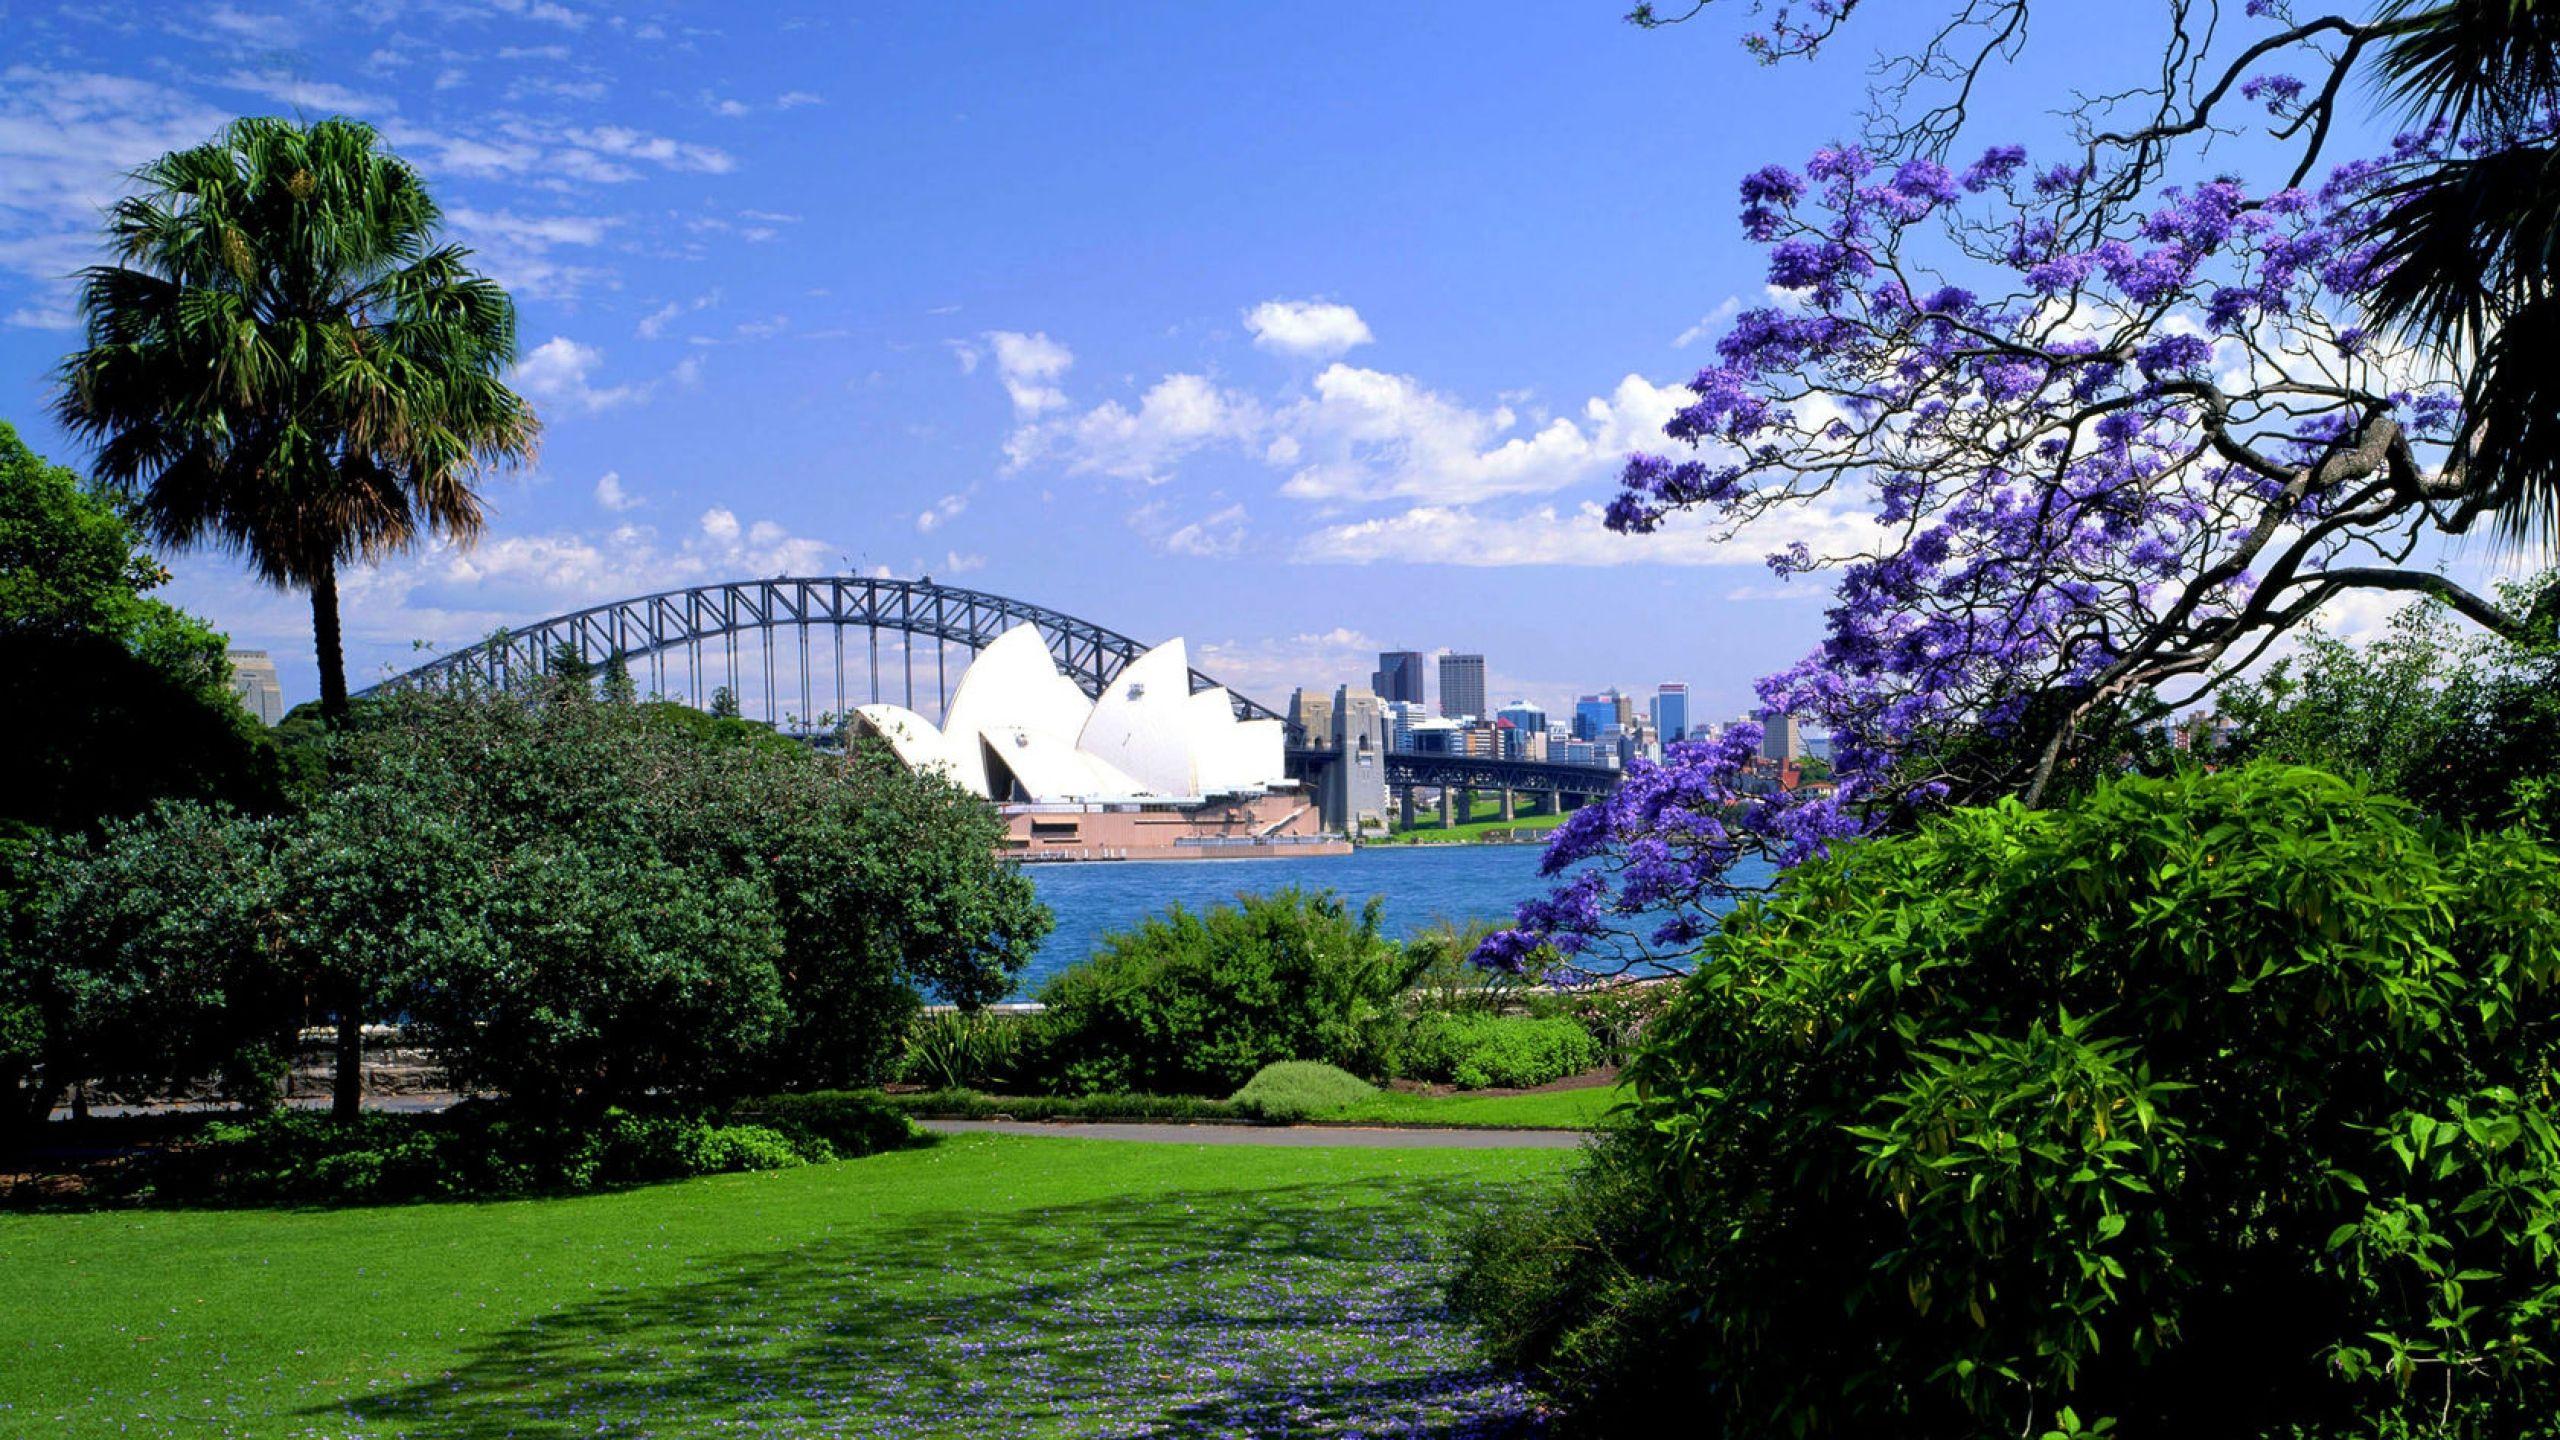 413f33ccce7eae464d15303b650cf9f8 - Sydney Opera House To Botanic Gardens Walk